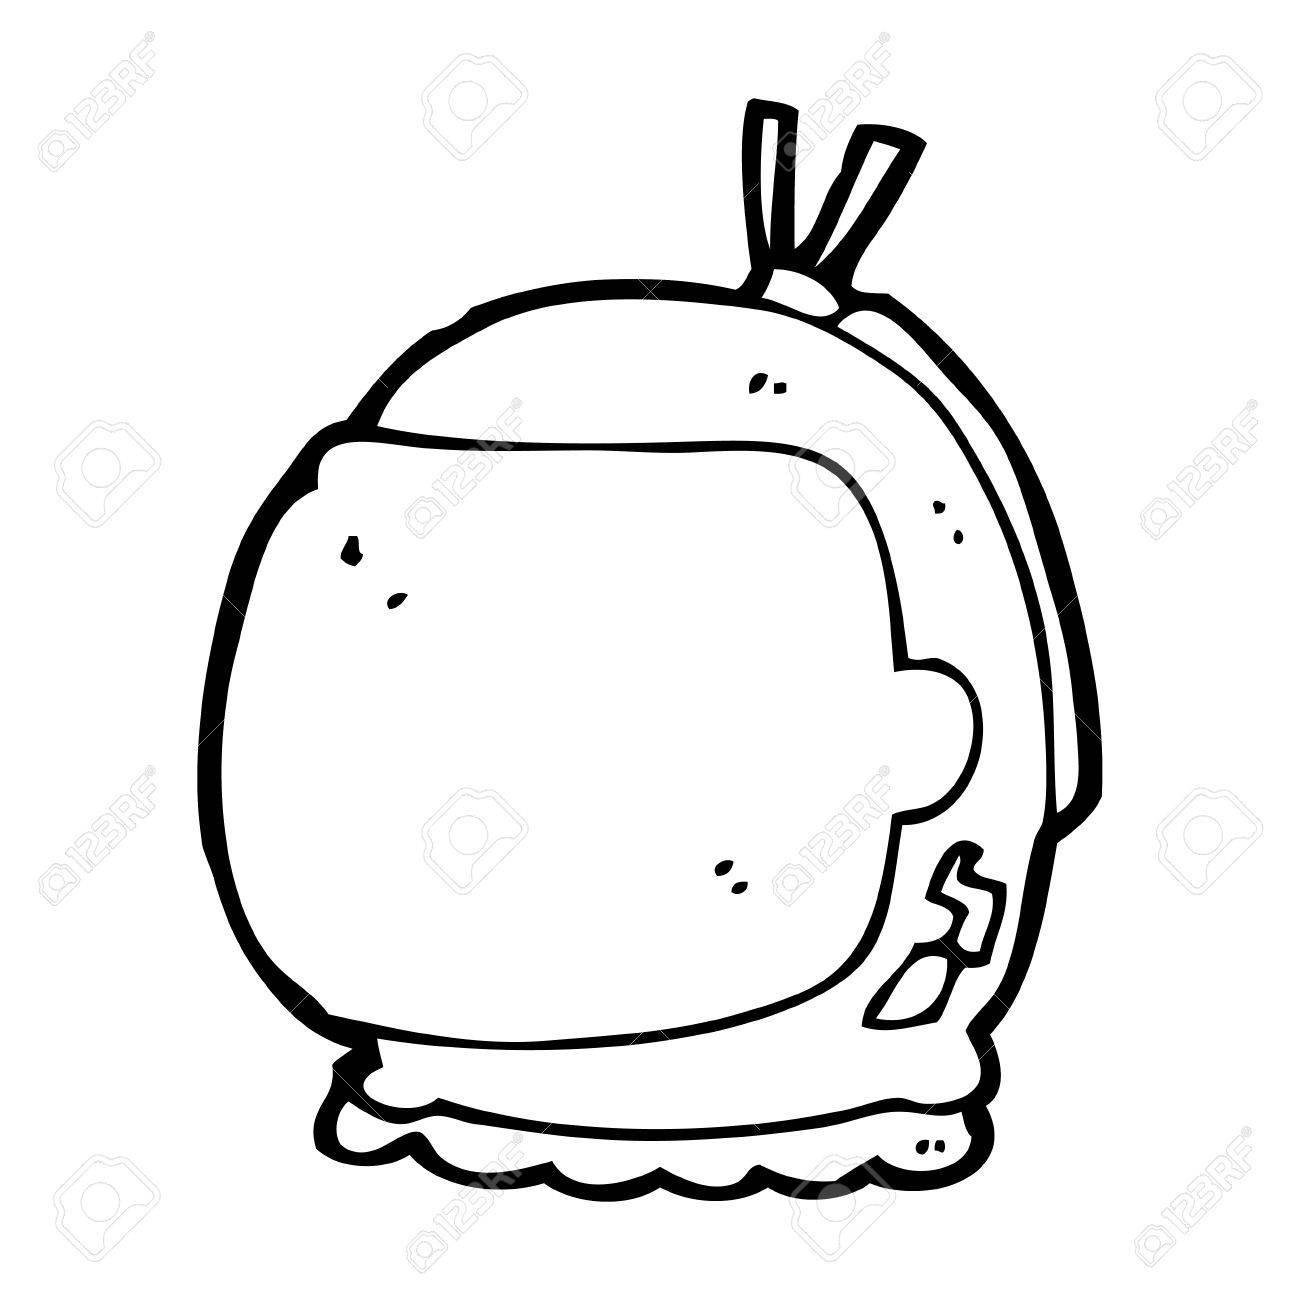 1300x1300 Cartoon Astronaut Helmet Royalty Free Cliparts, Vectors, And Stock